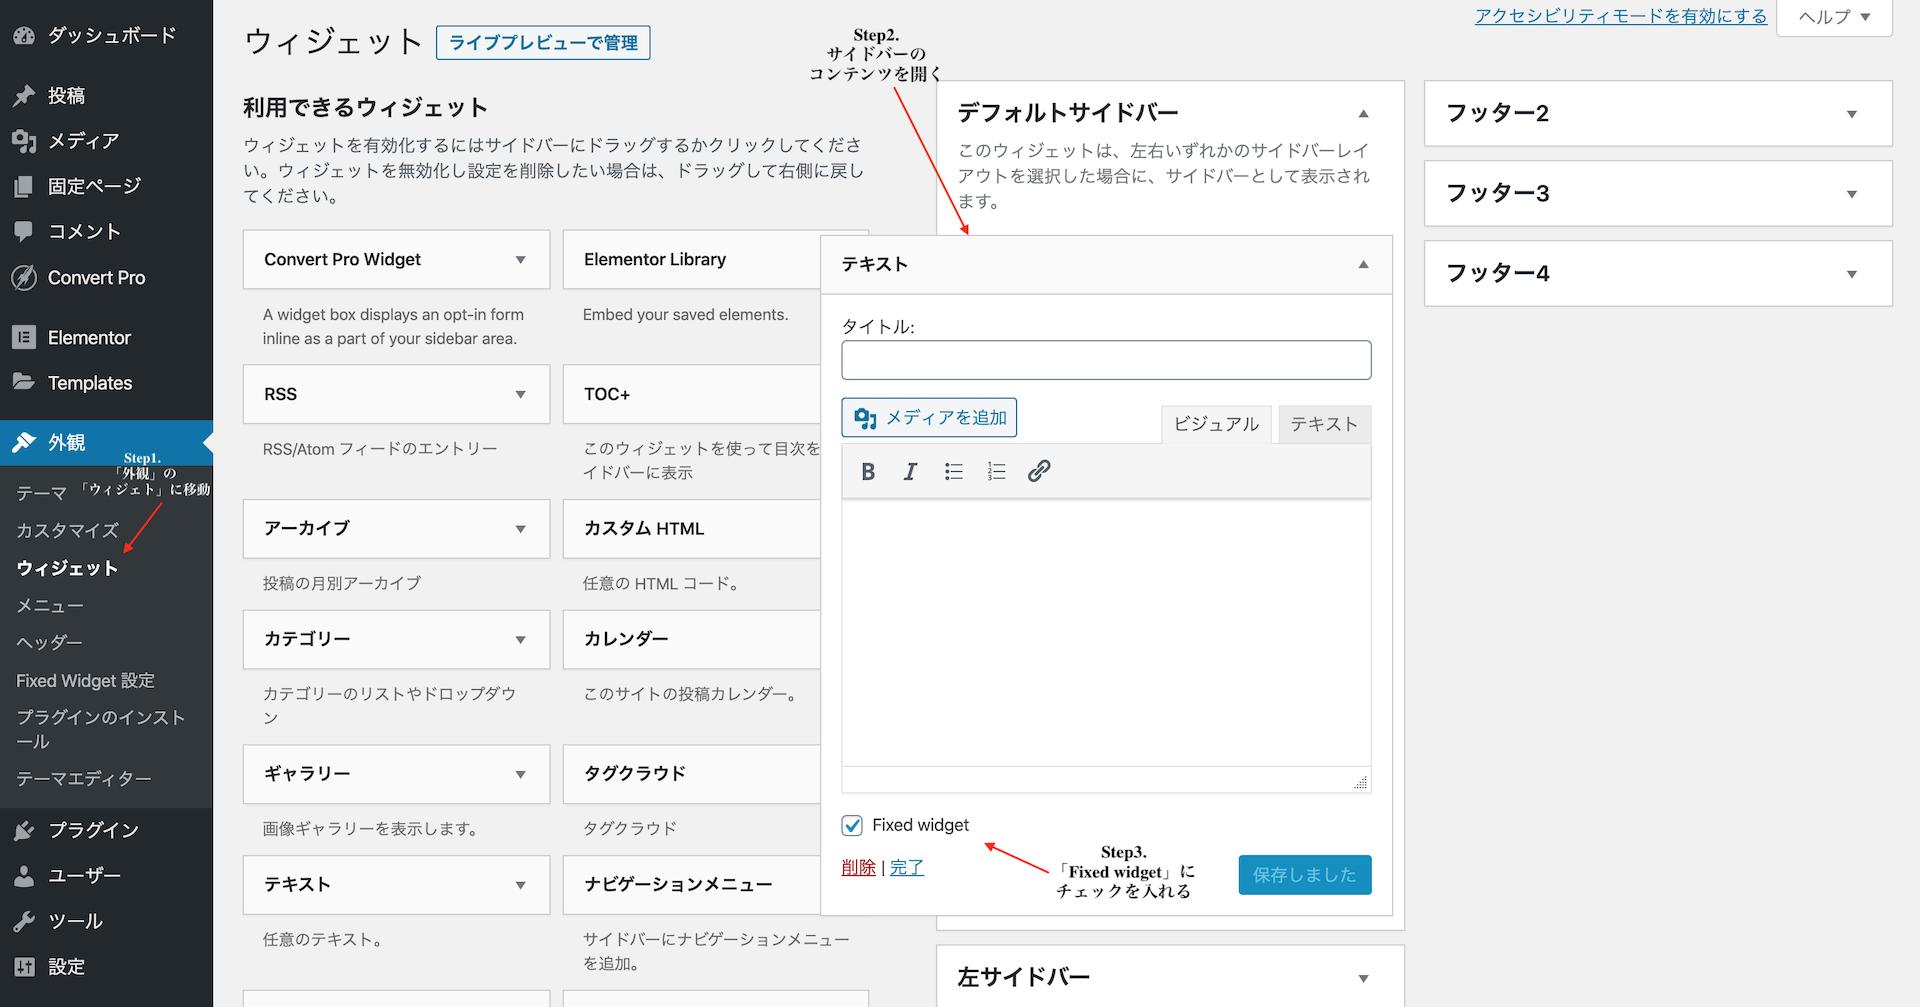 Q2W3 Fixed Widget for WordPressでサイドバーを固定化する方法